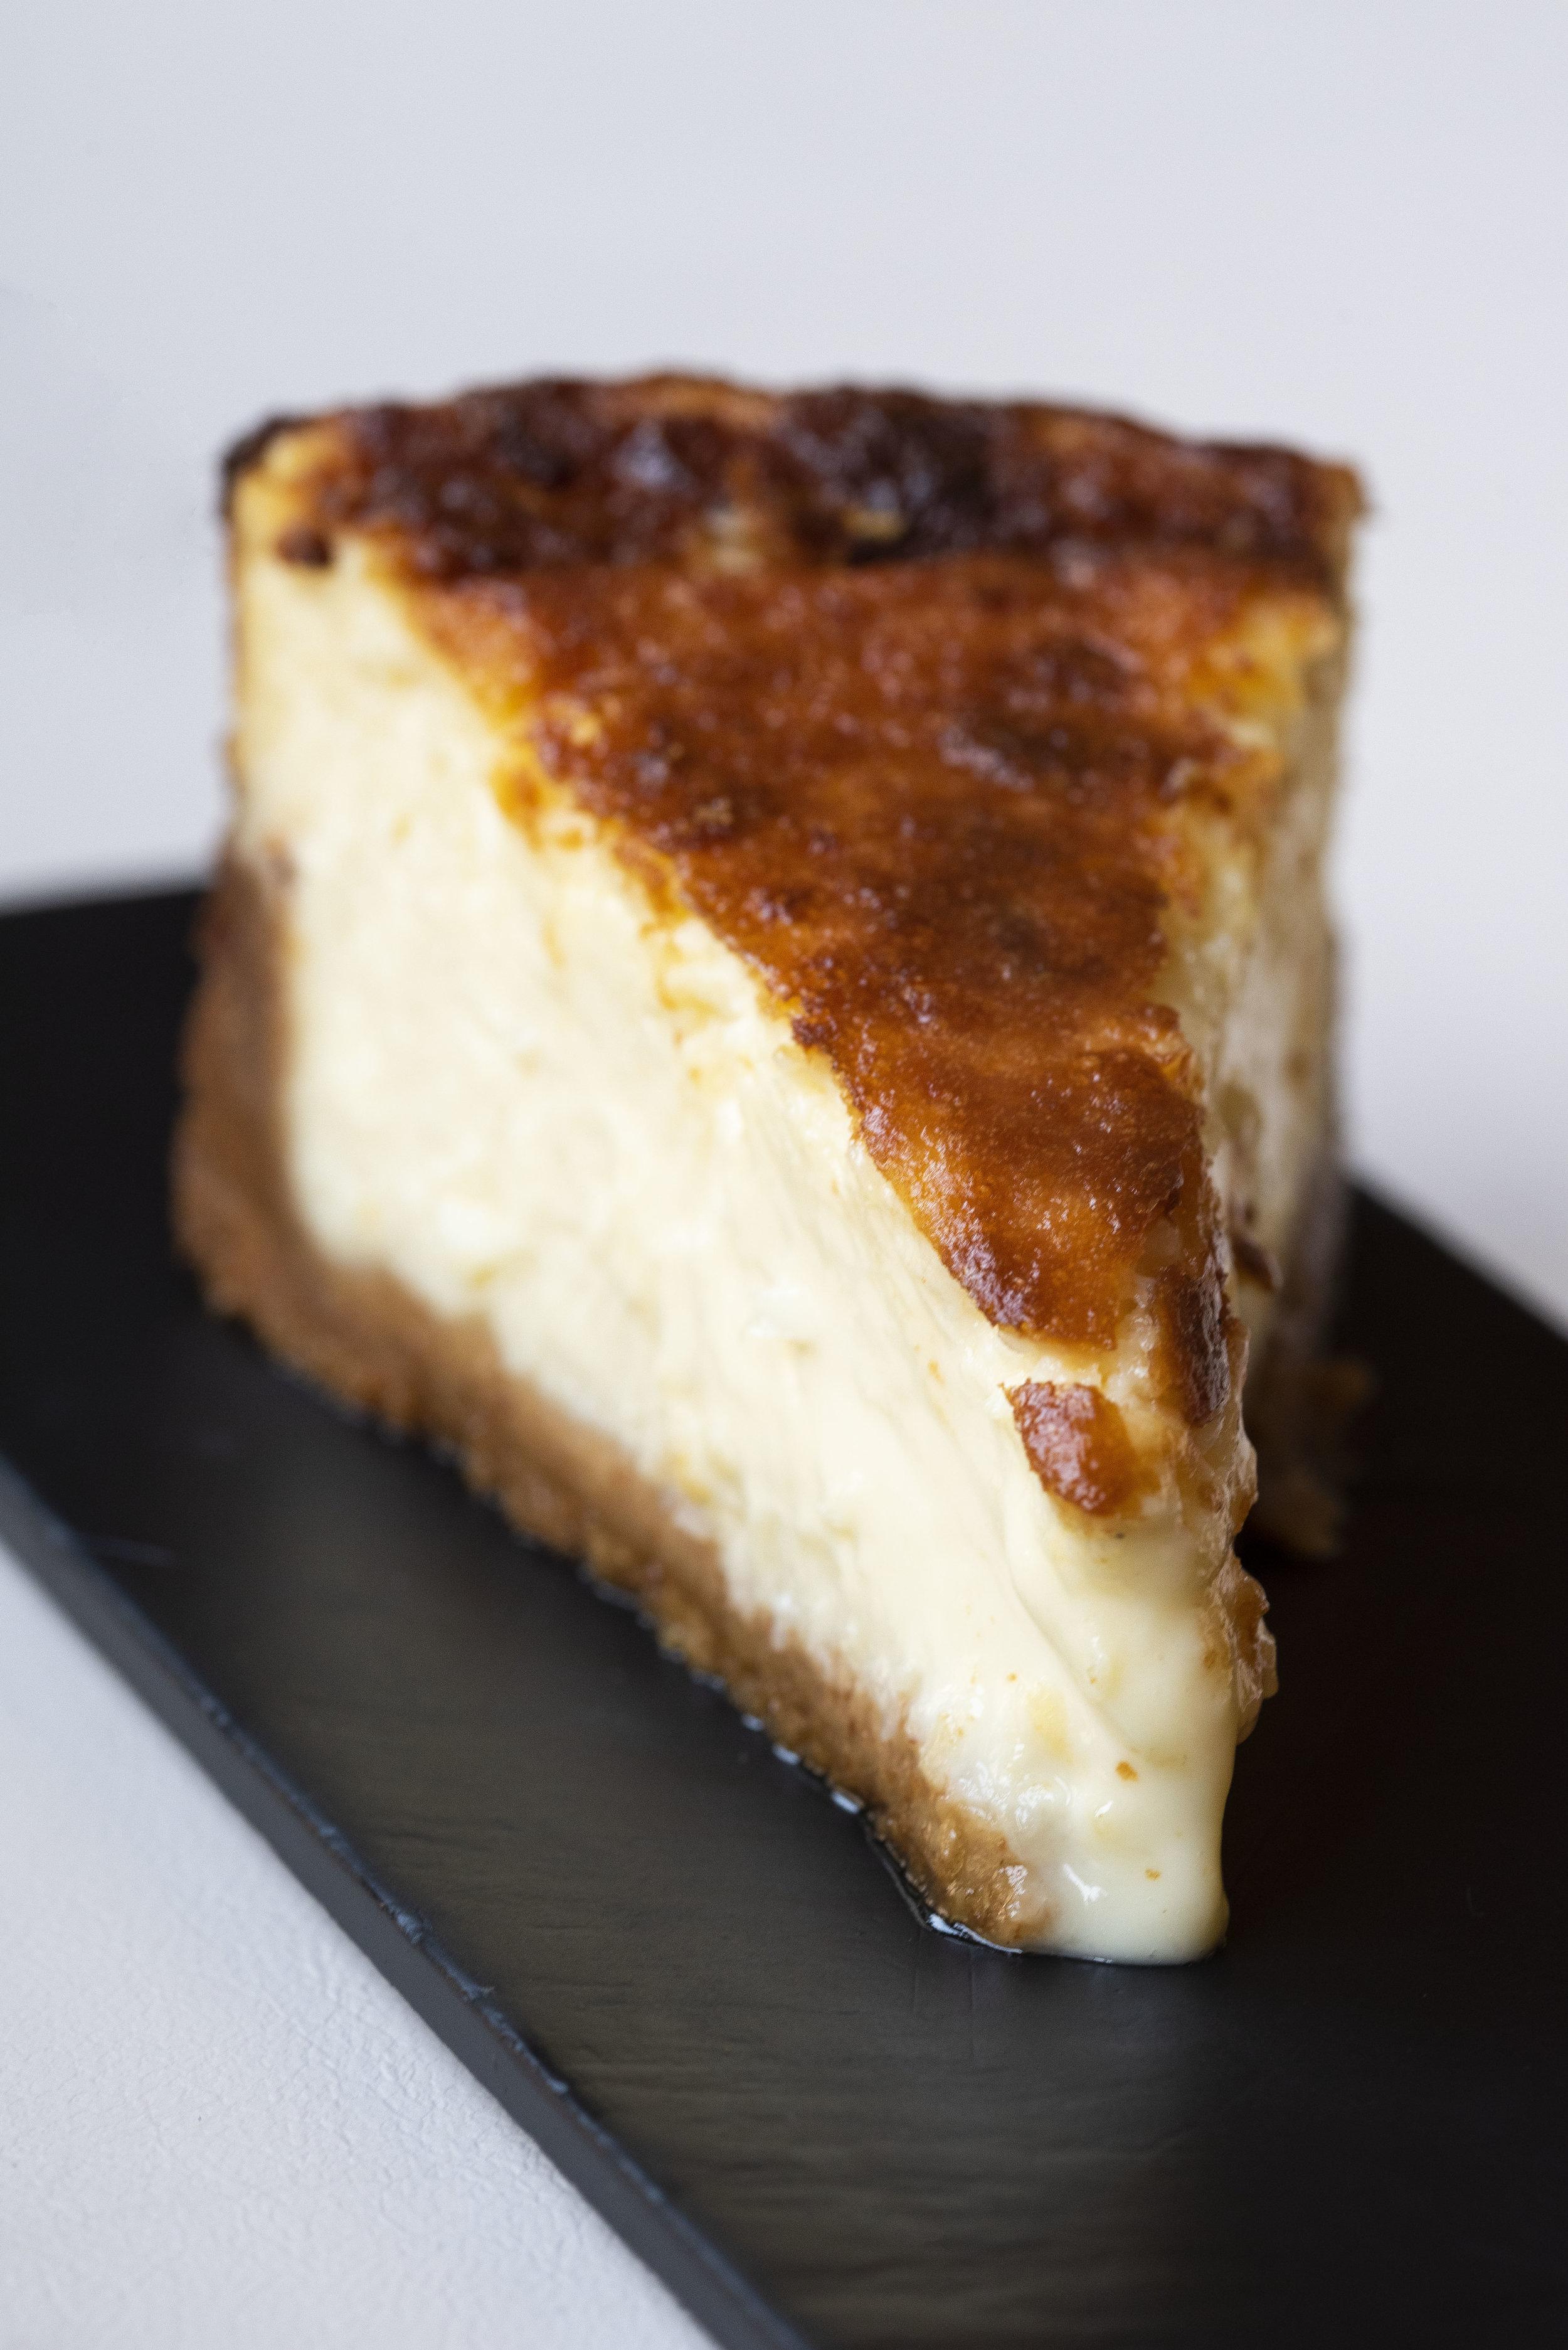 Idiziazábal cheesecake at Calabrasa, Barcelona. Photo © Barcelona Food Experience.